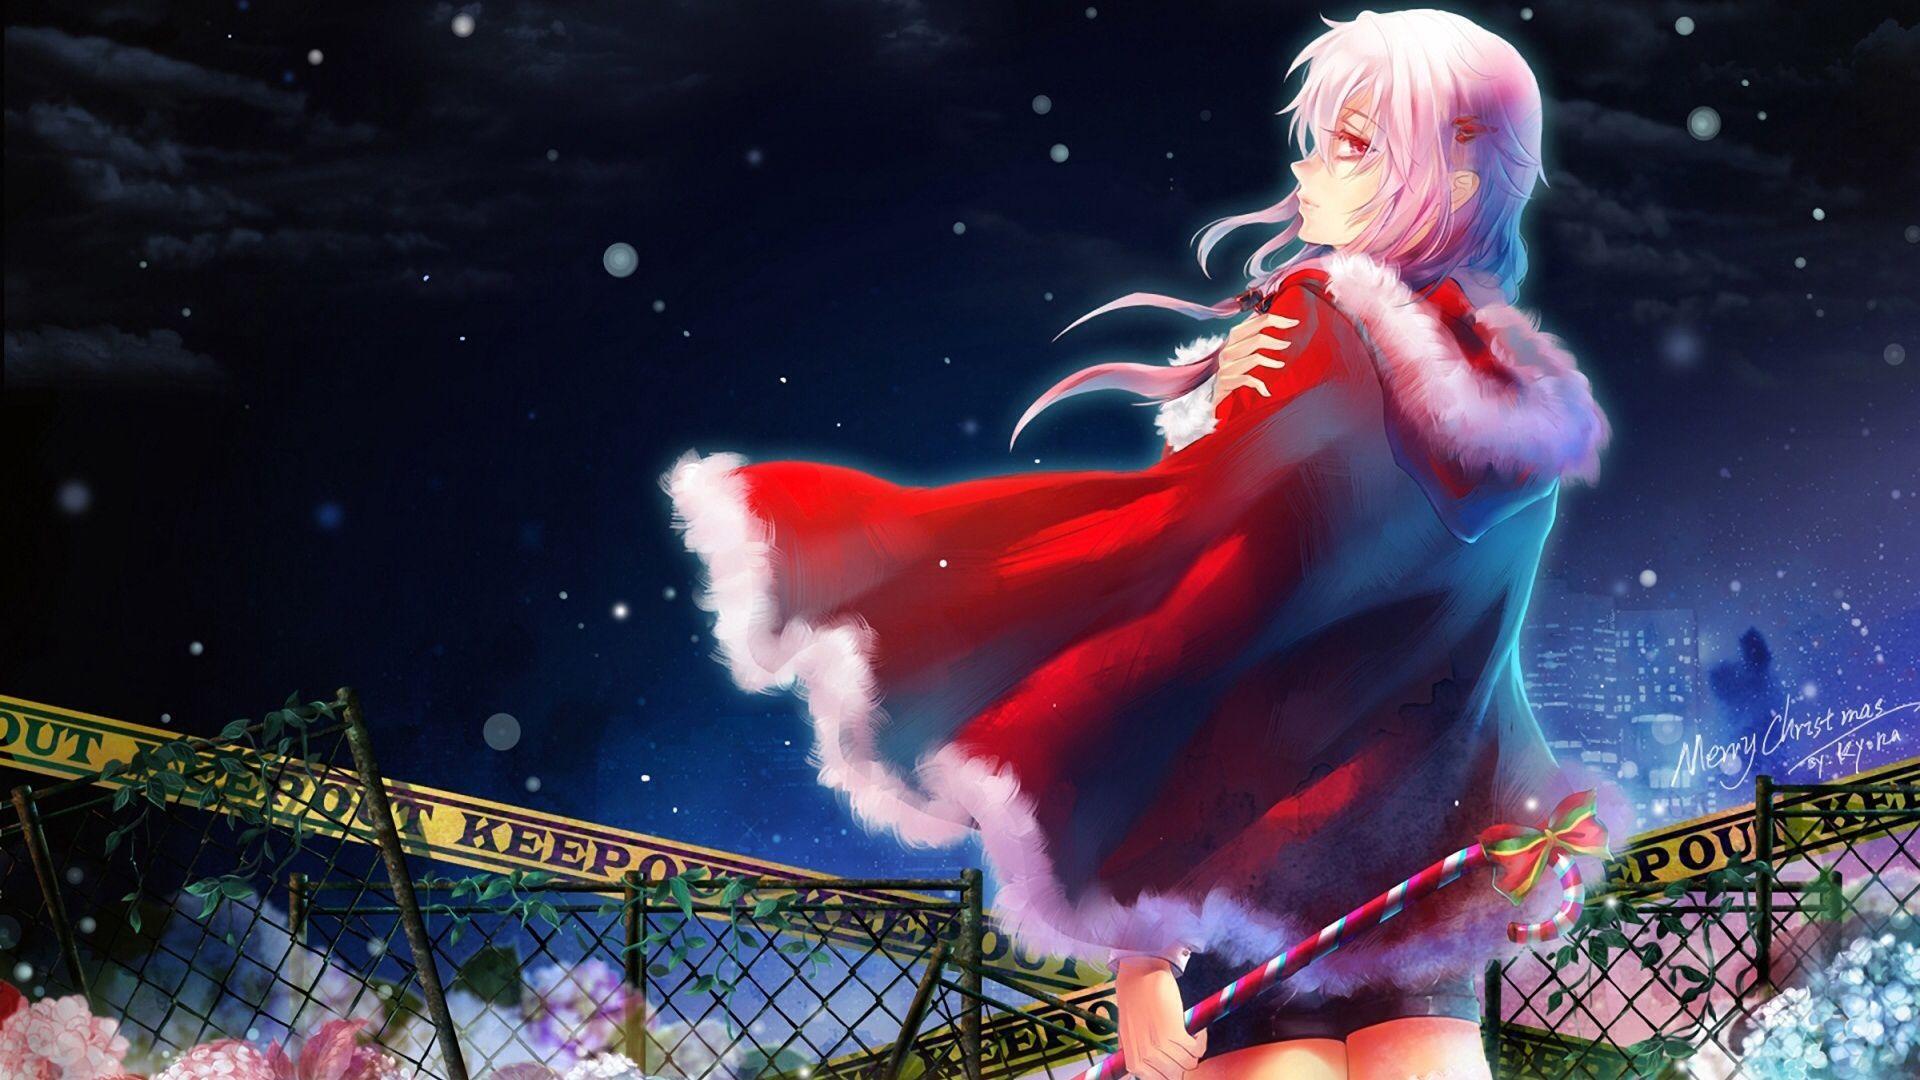 Anime Christmas Wallpaper (92 Wallpapers) - Wallpapers 4k